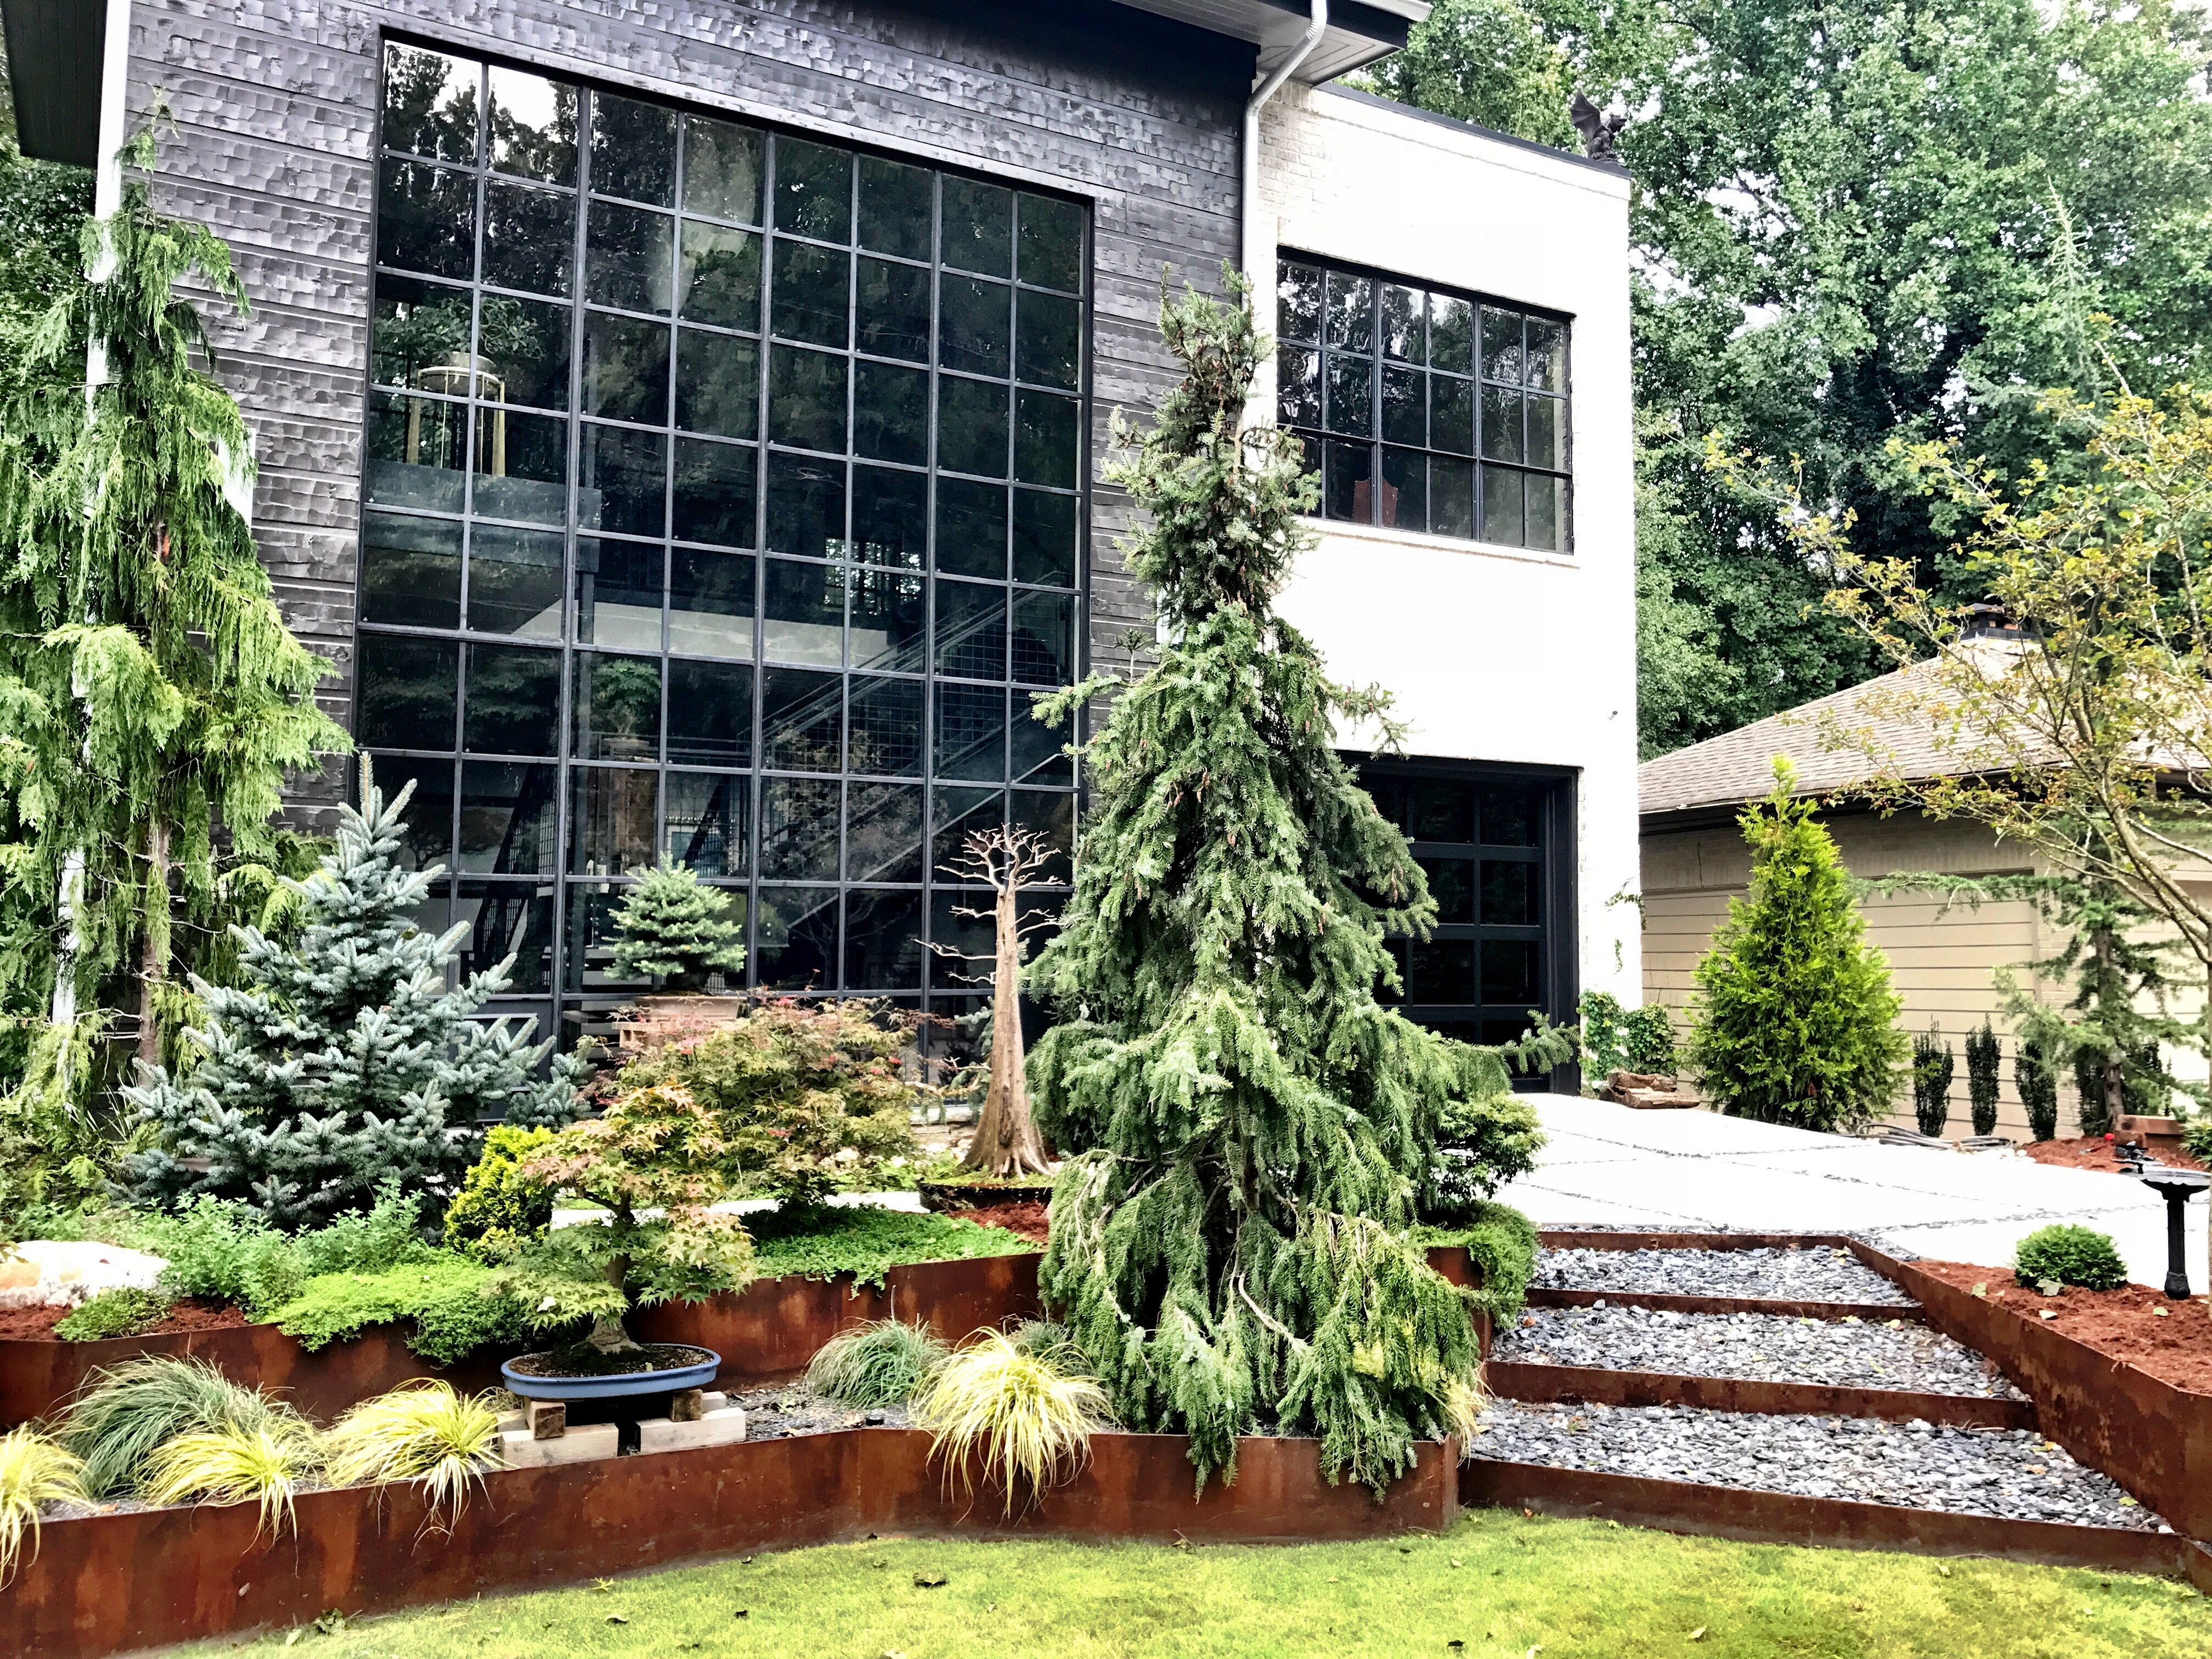 Corten Steel Conifer Collecton Garden By Brendan Butler